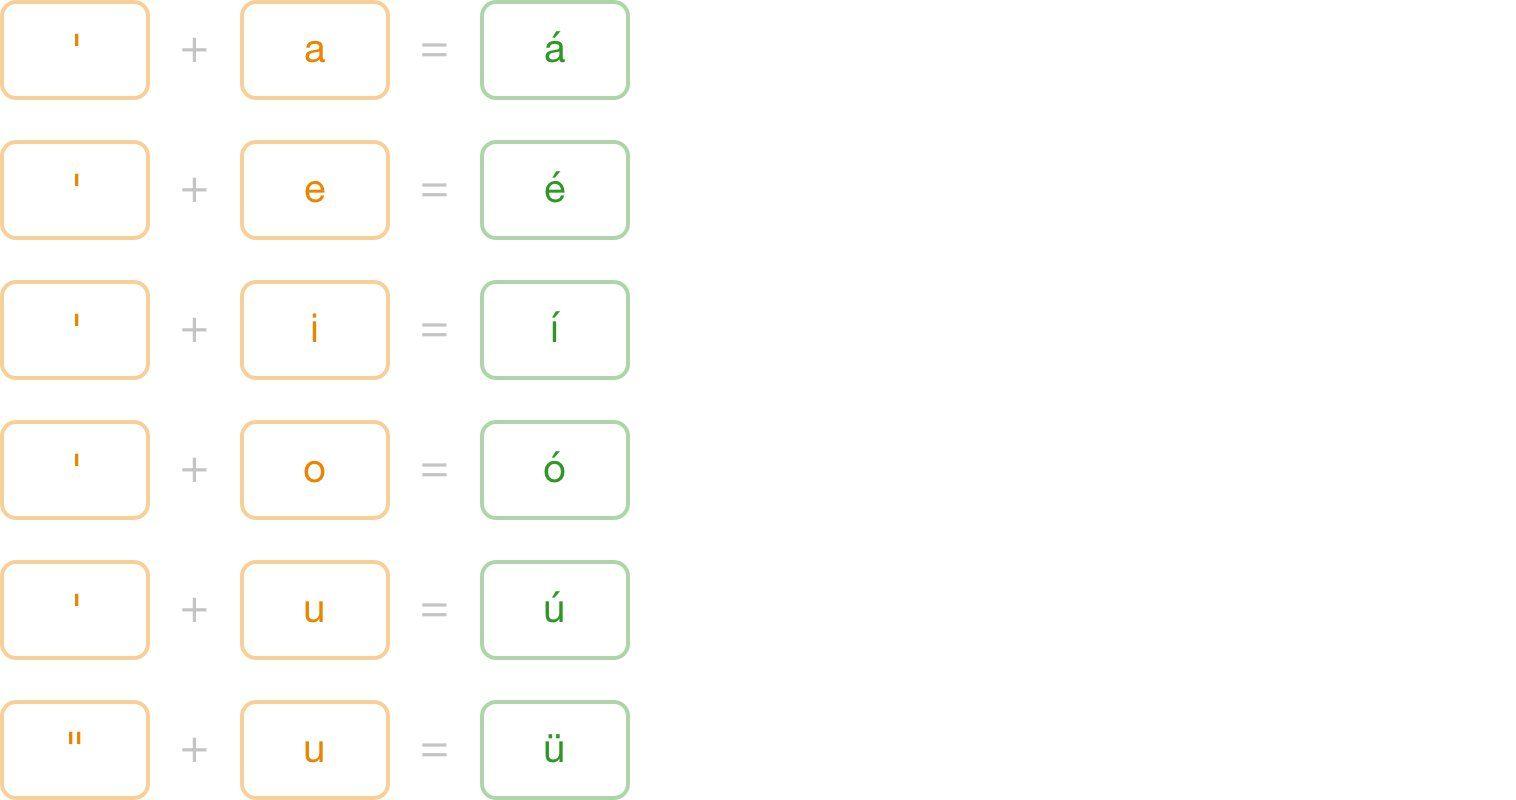 Type Spanish Accents On International Keyboard My Tool Box